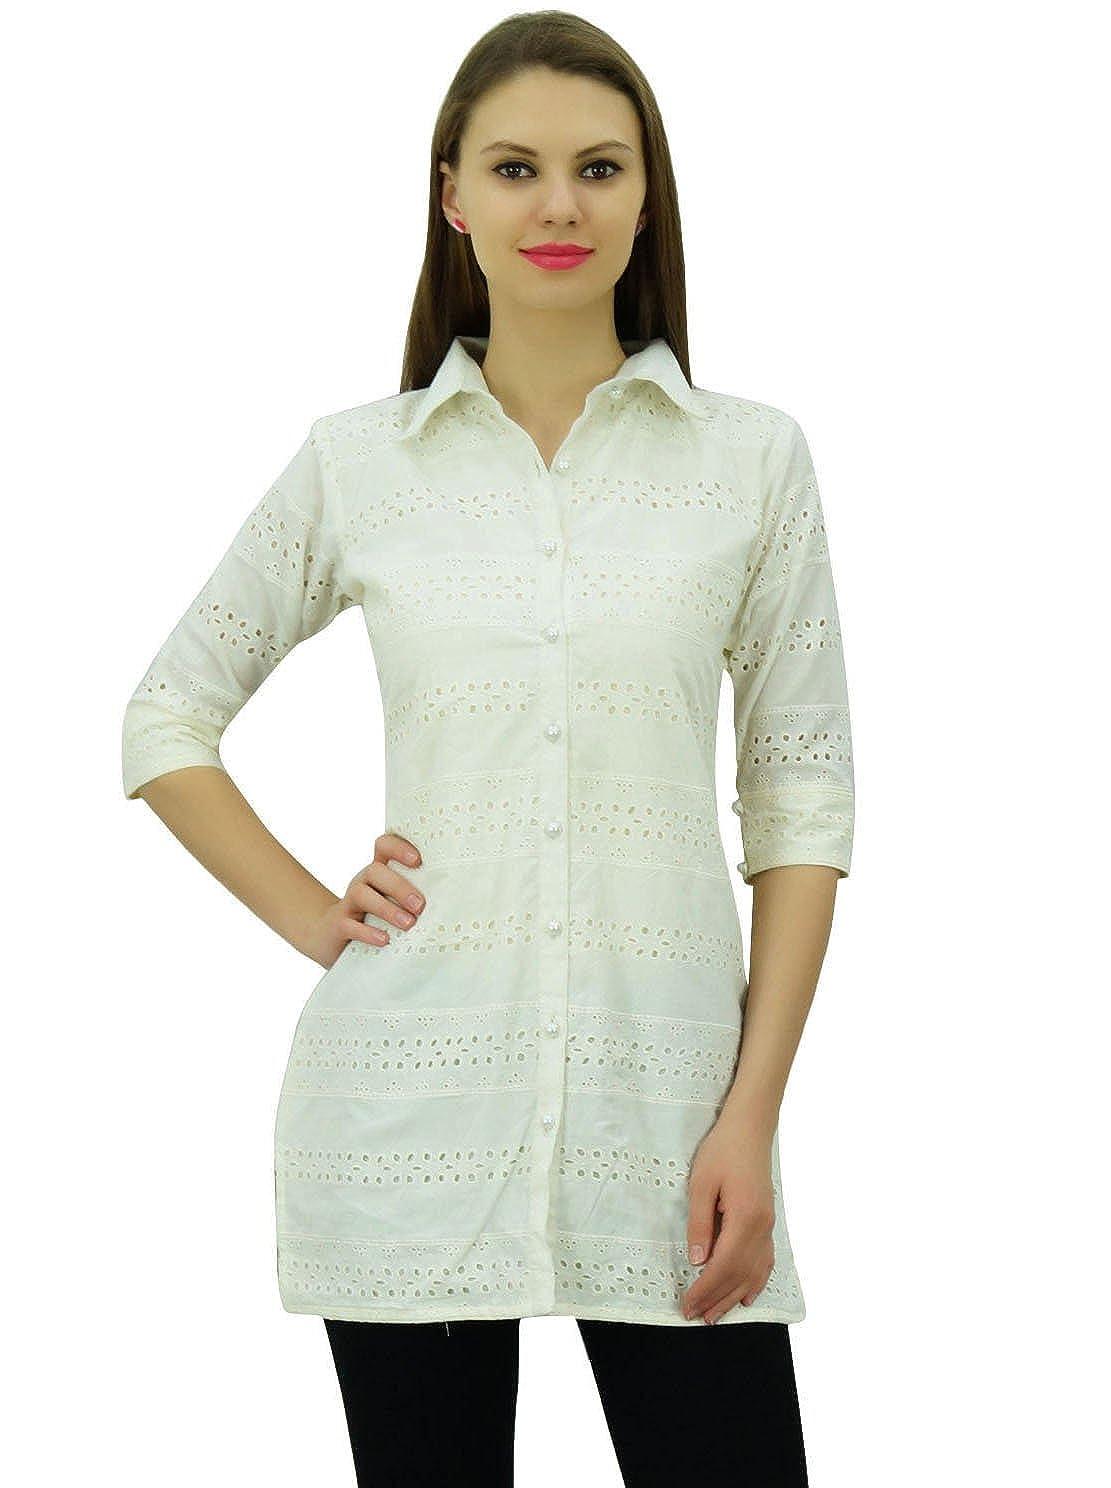 Bimba Women's Solid Cotton Tunic Shirt 3/4 Sleeve Short Kurti Collar Neck Top PAR-BIM-E512A